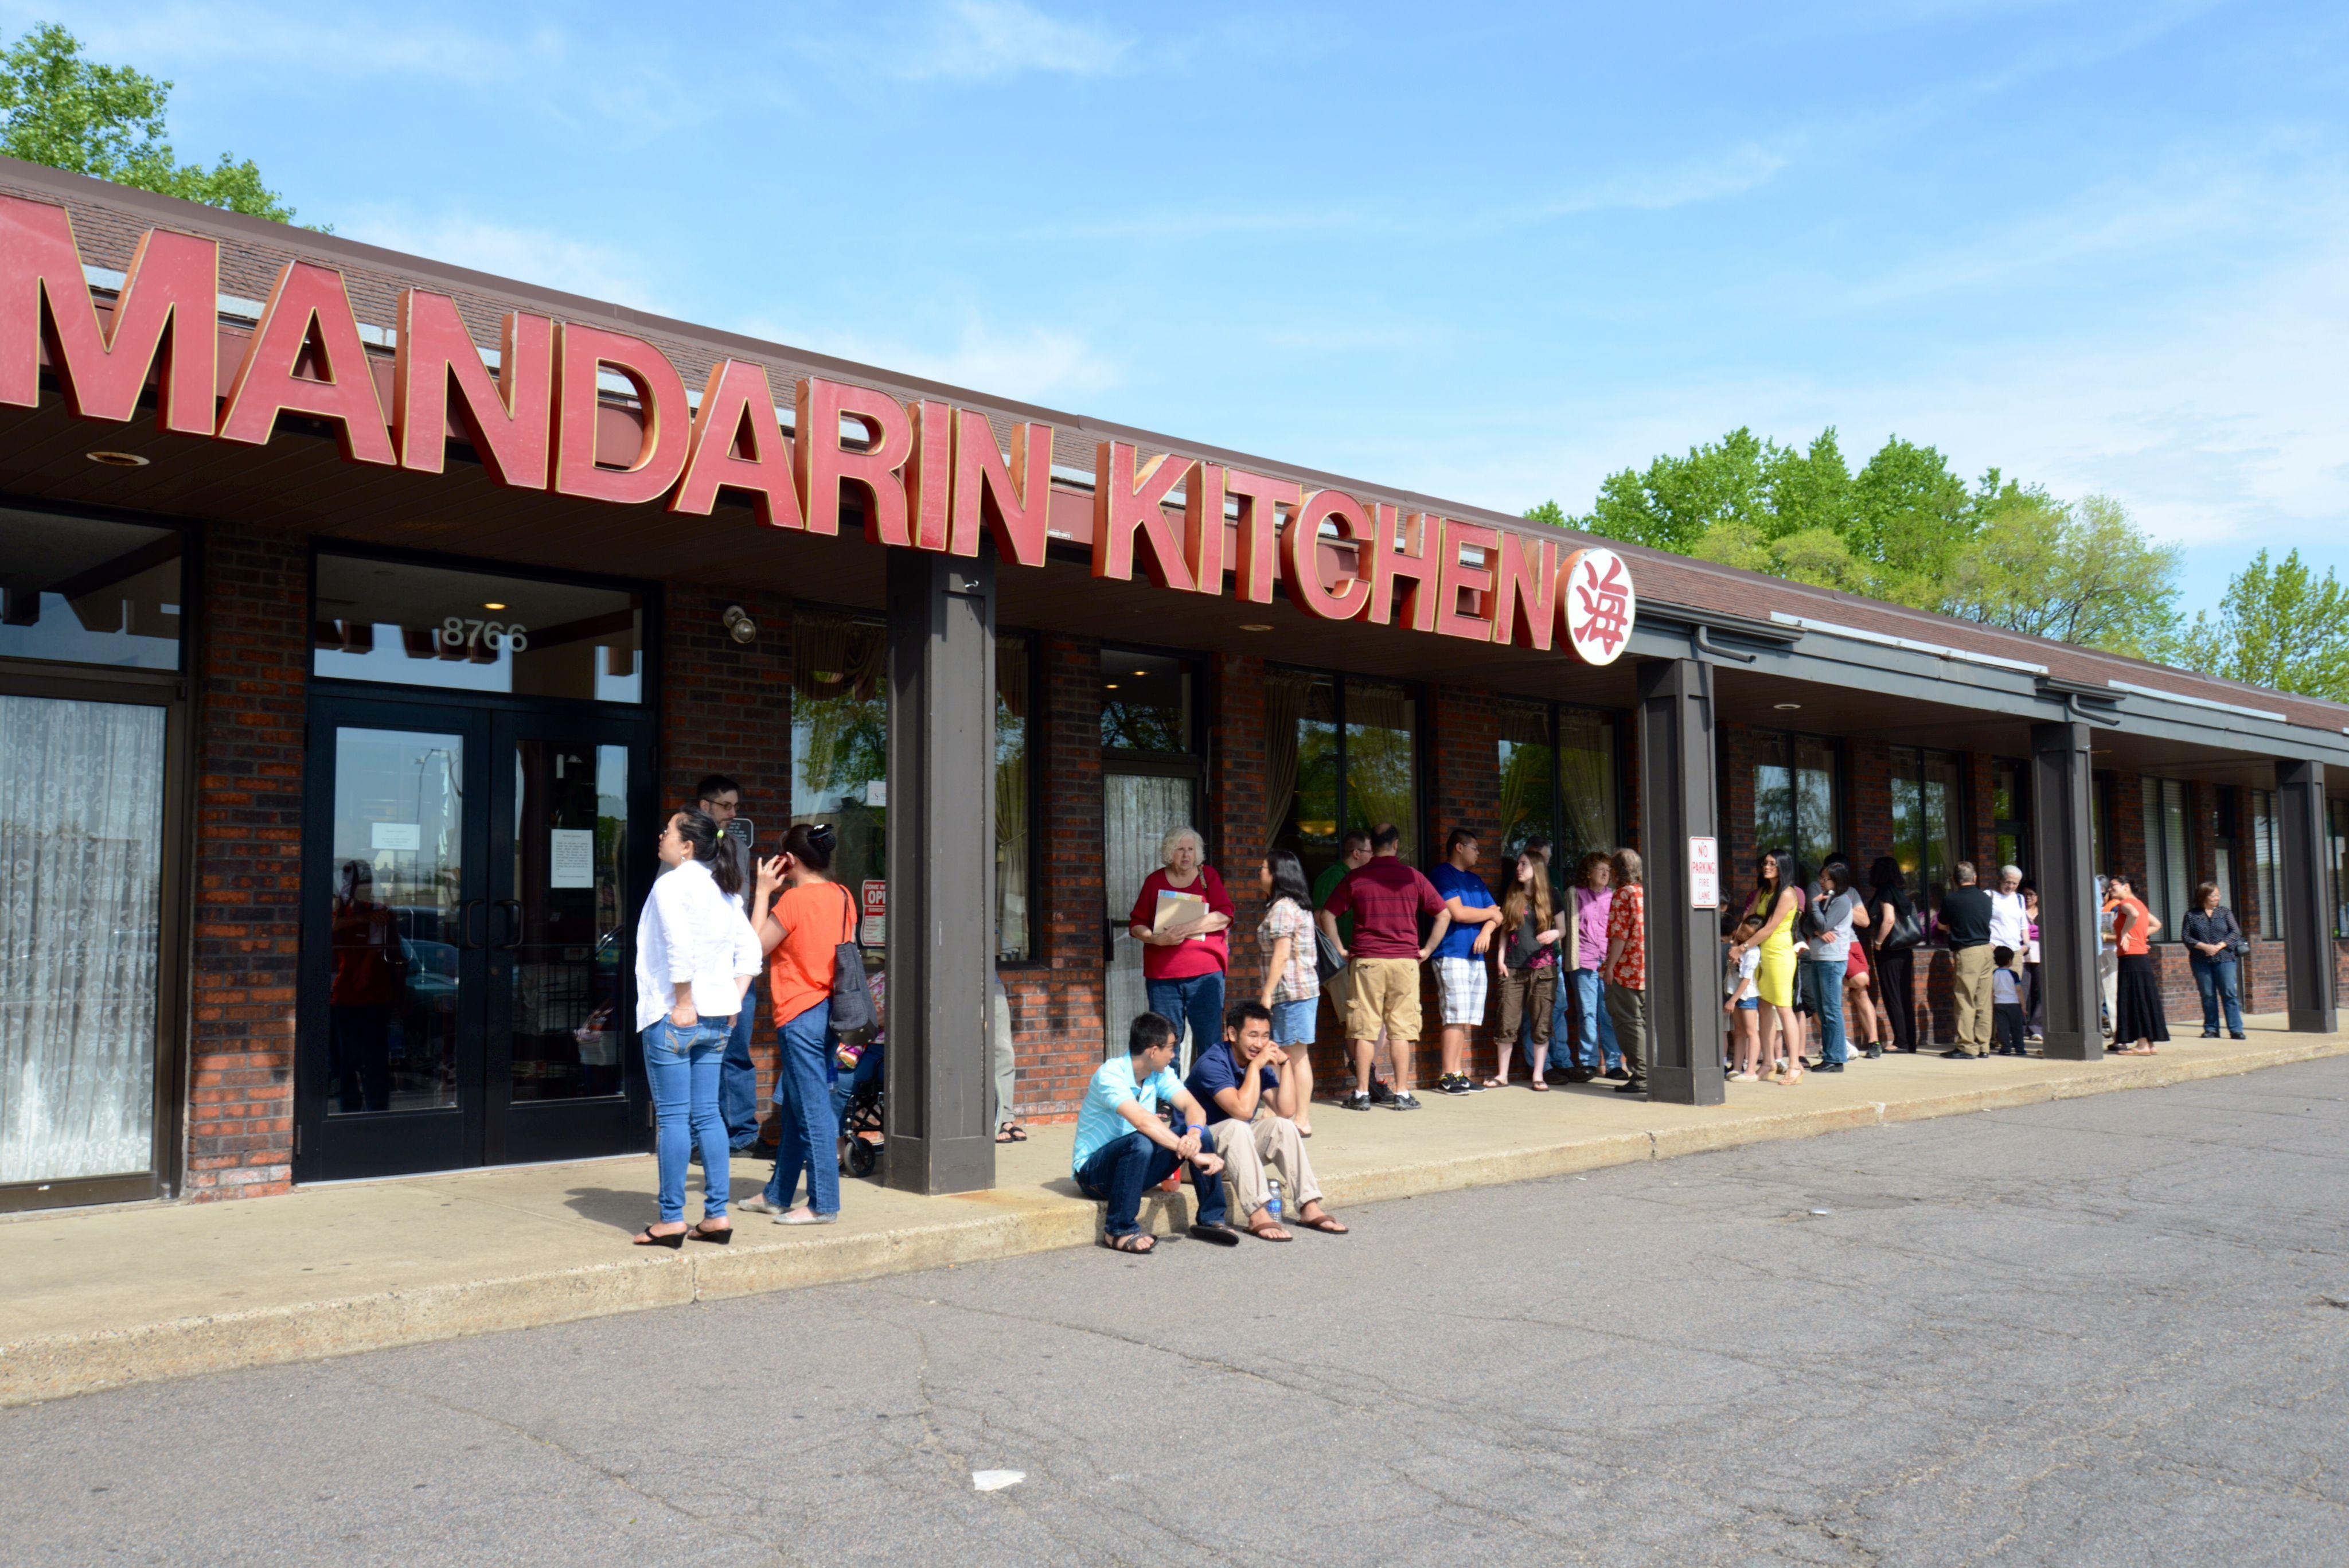 Mandarin Kitchen Bloomington Mn Mall Of America Roadside